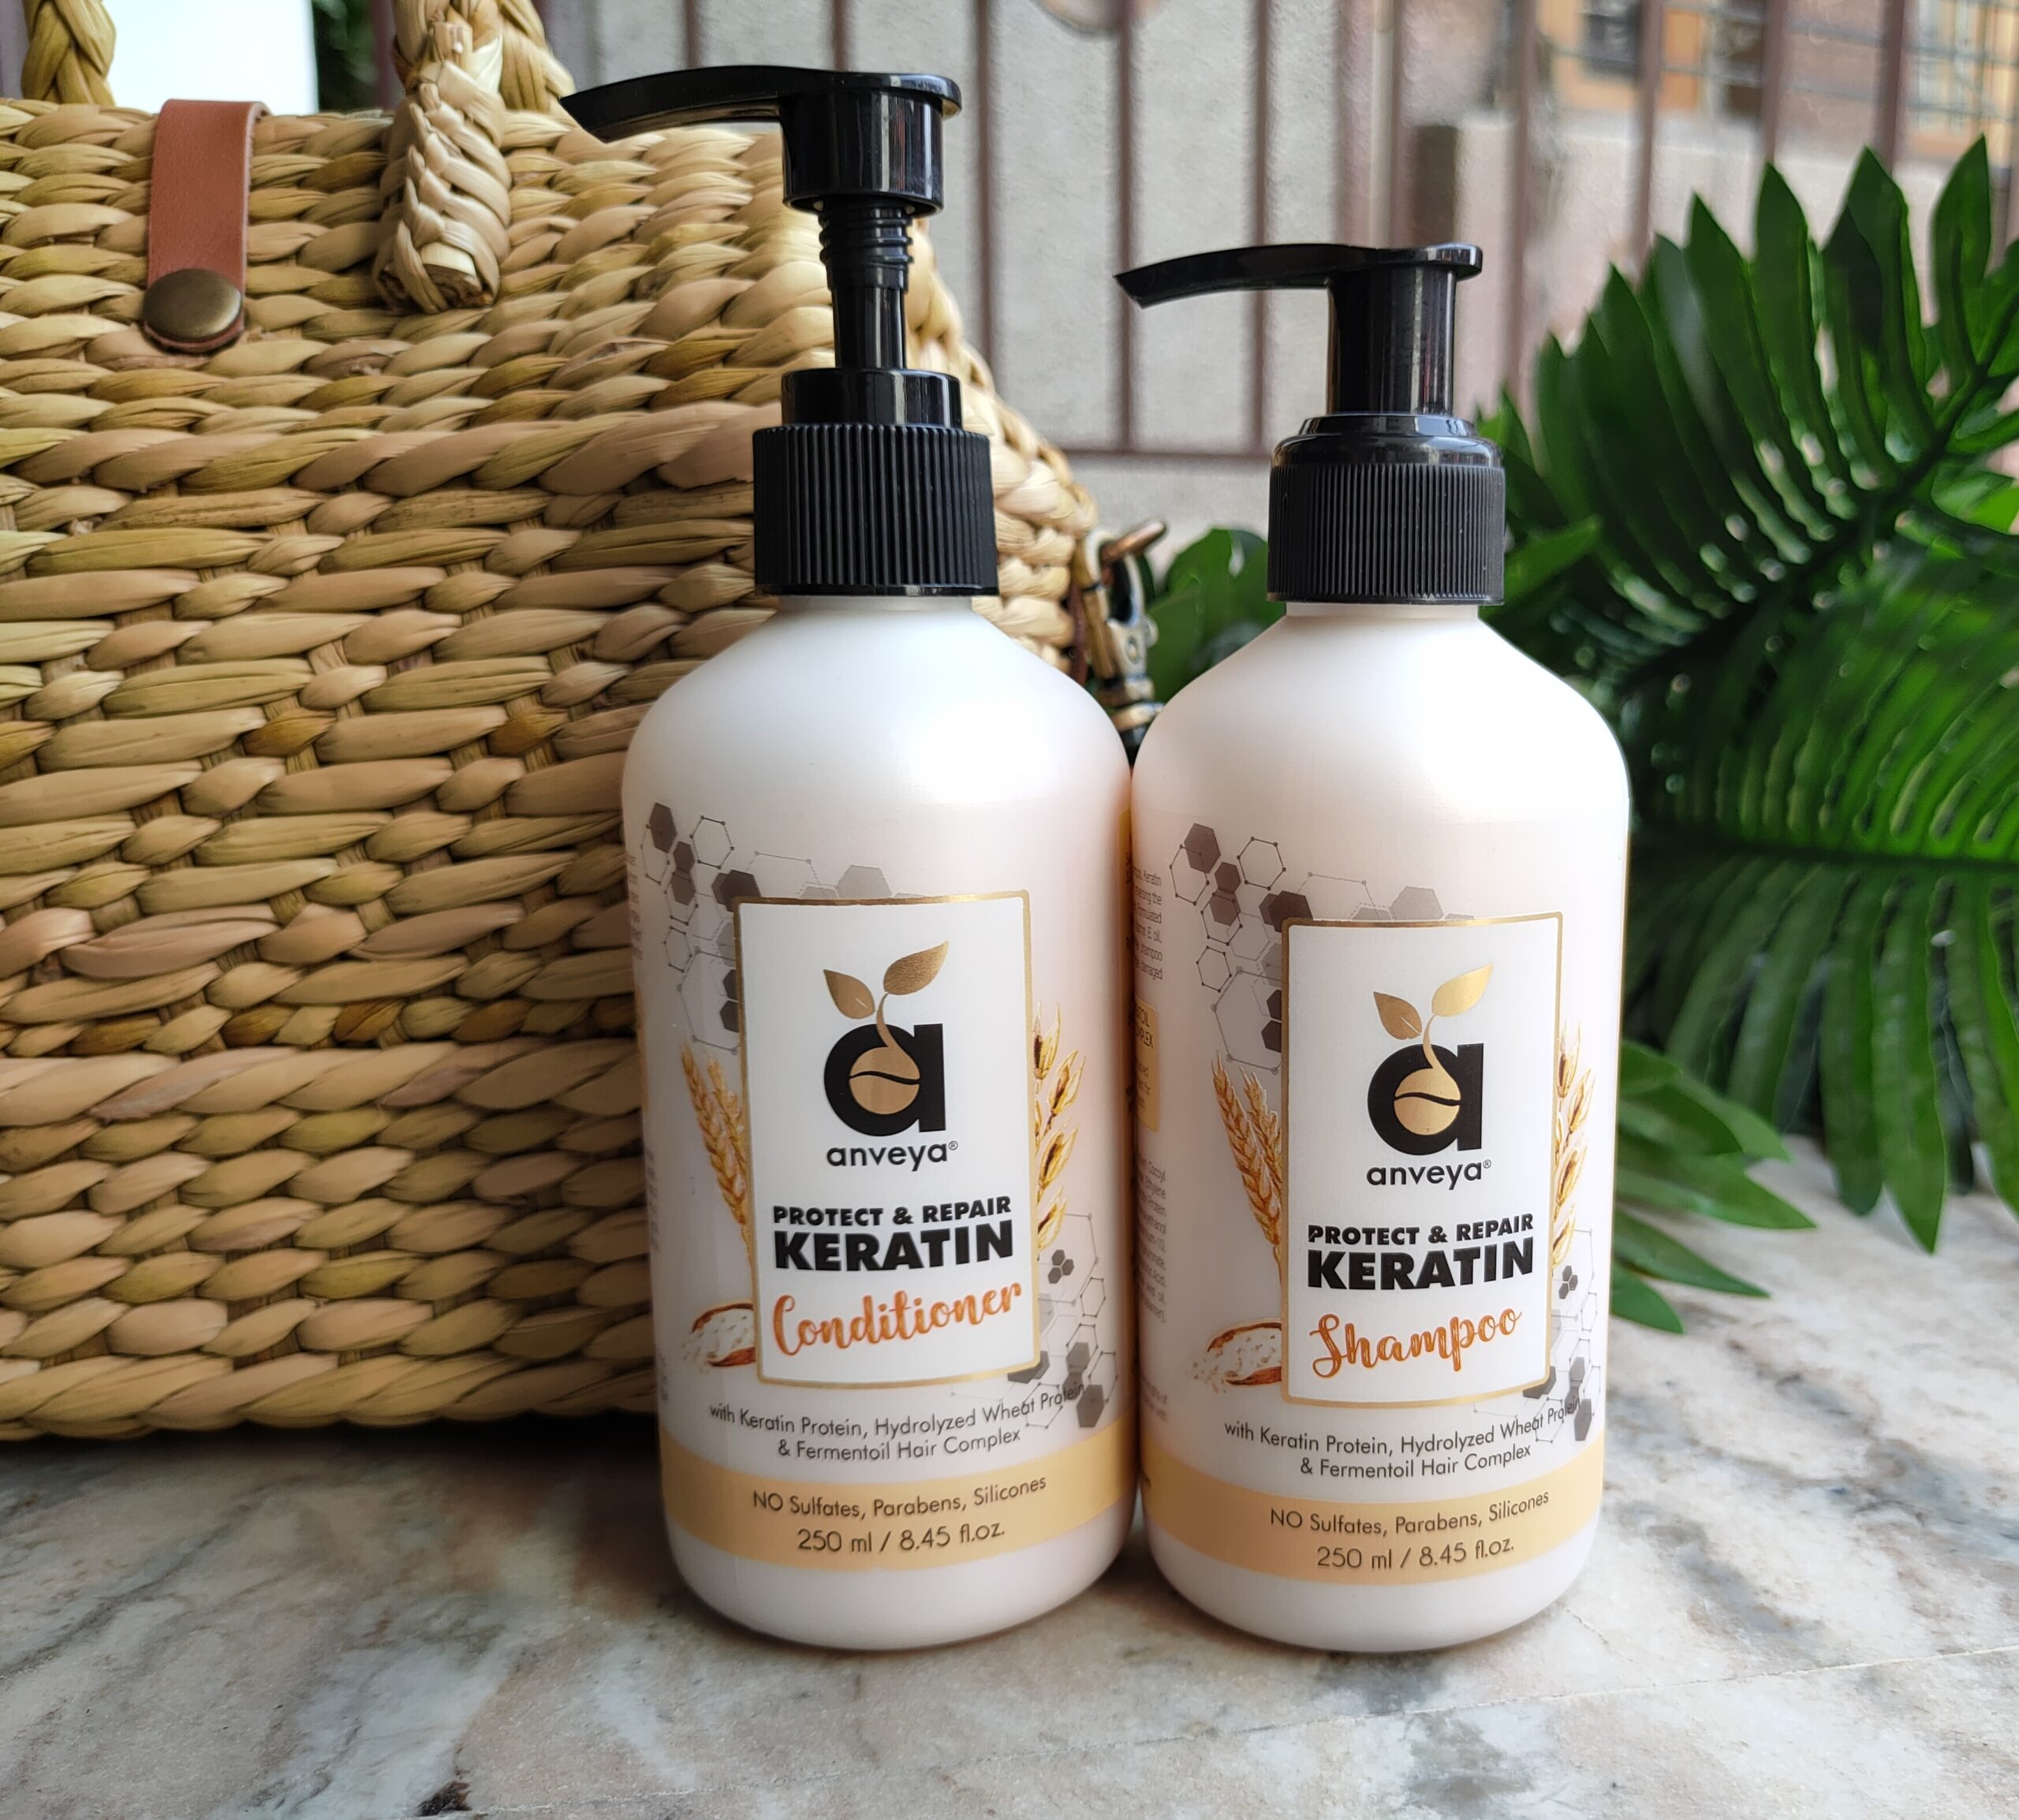 Anveya Protect & Repair Keratin Shampoo and Conditioner Review